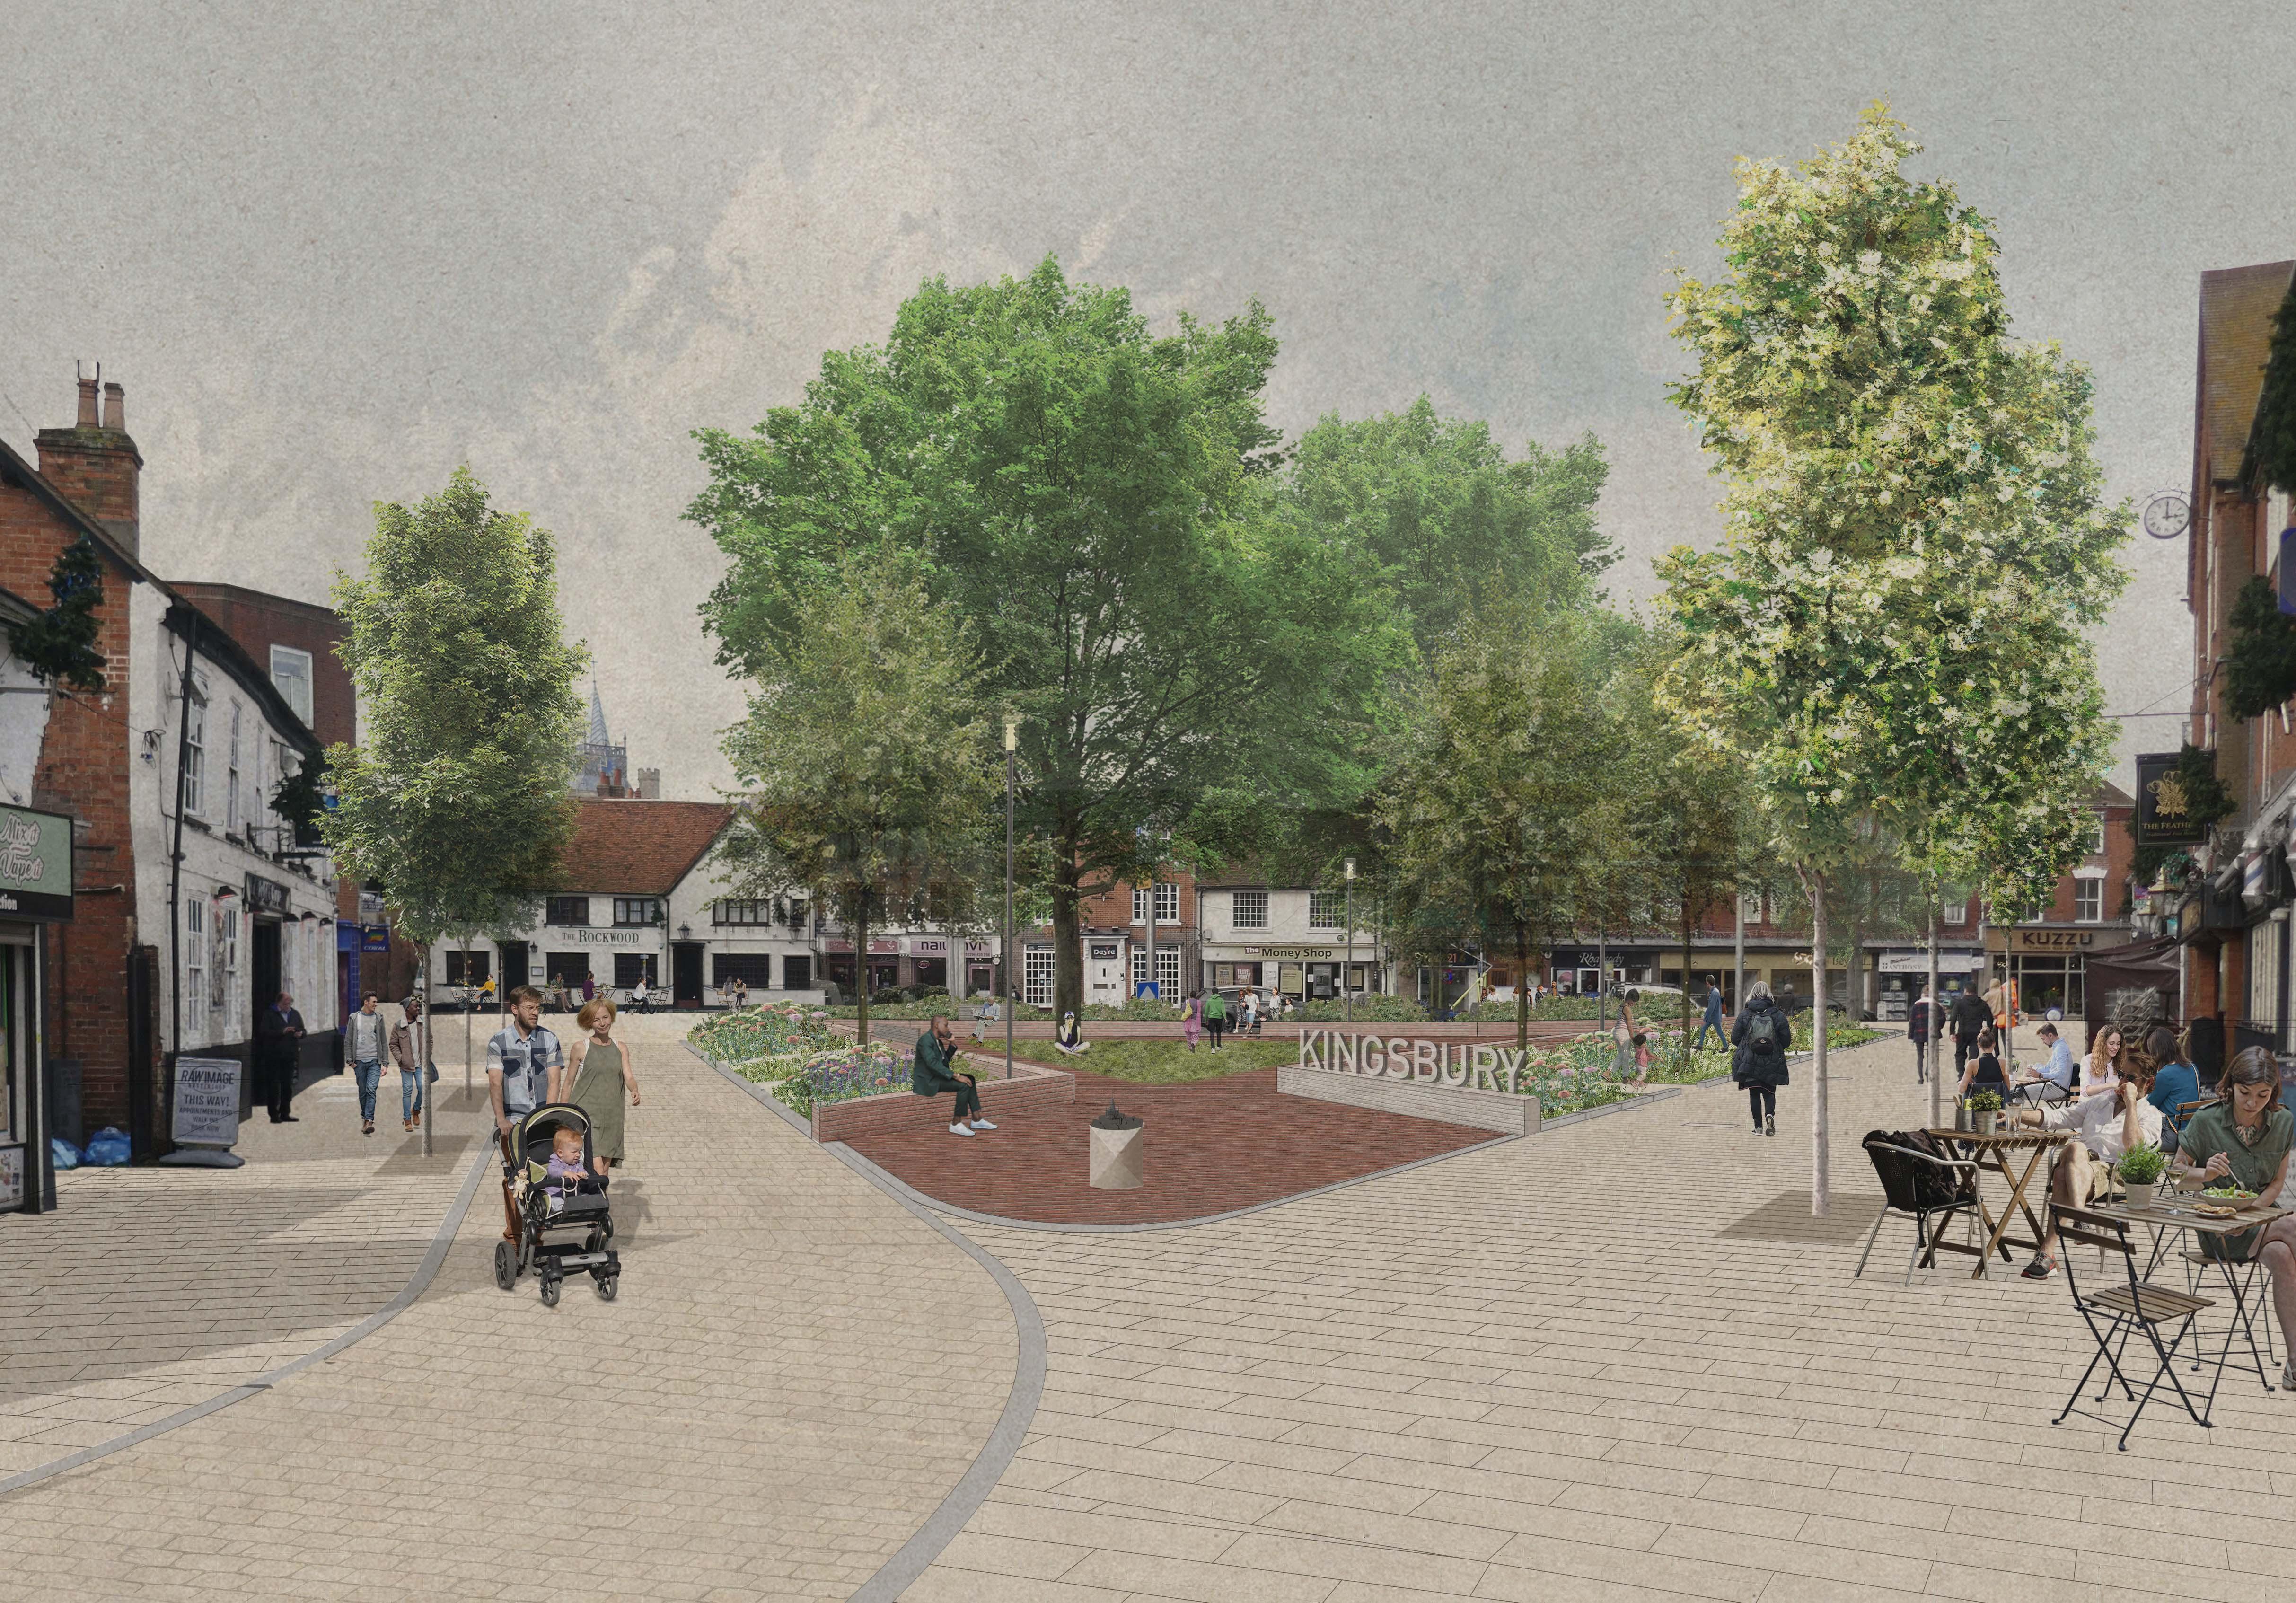 Section 3 - Pre-Planning Design Proposals